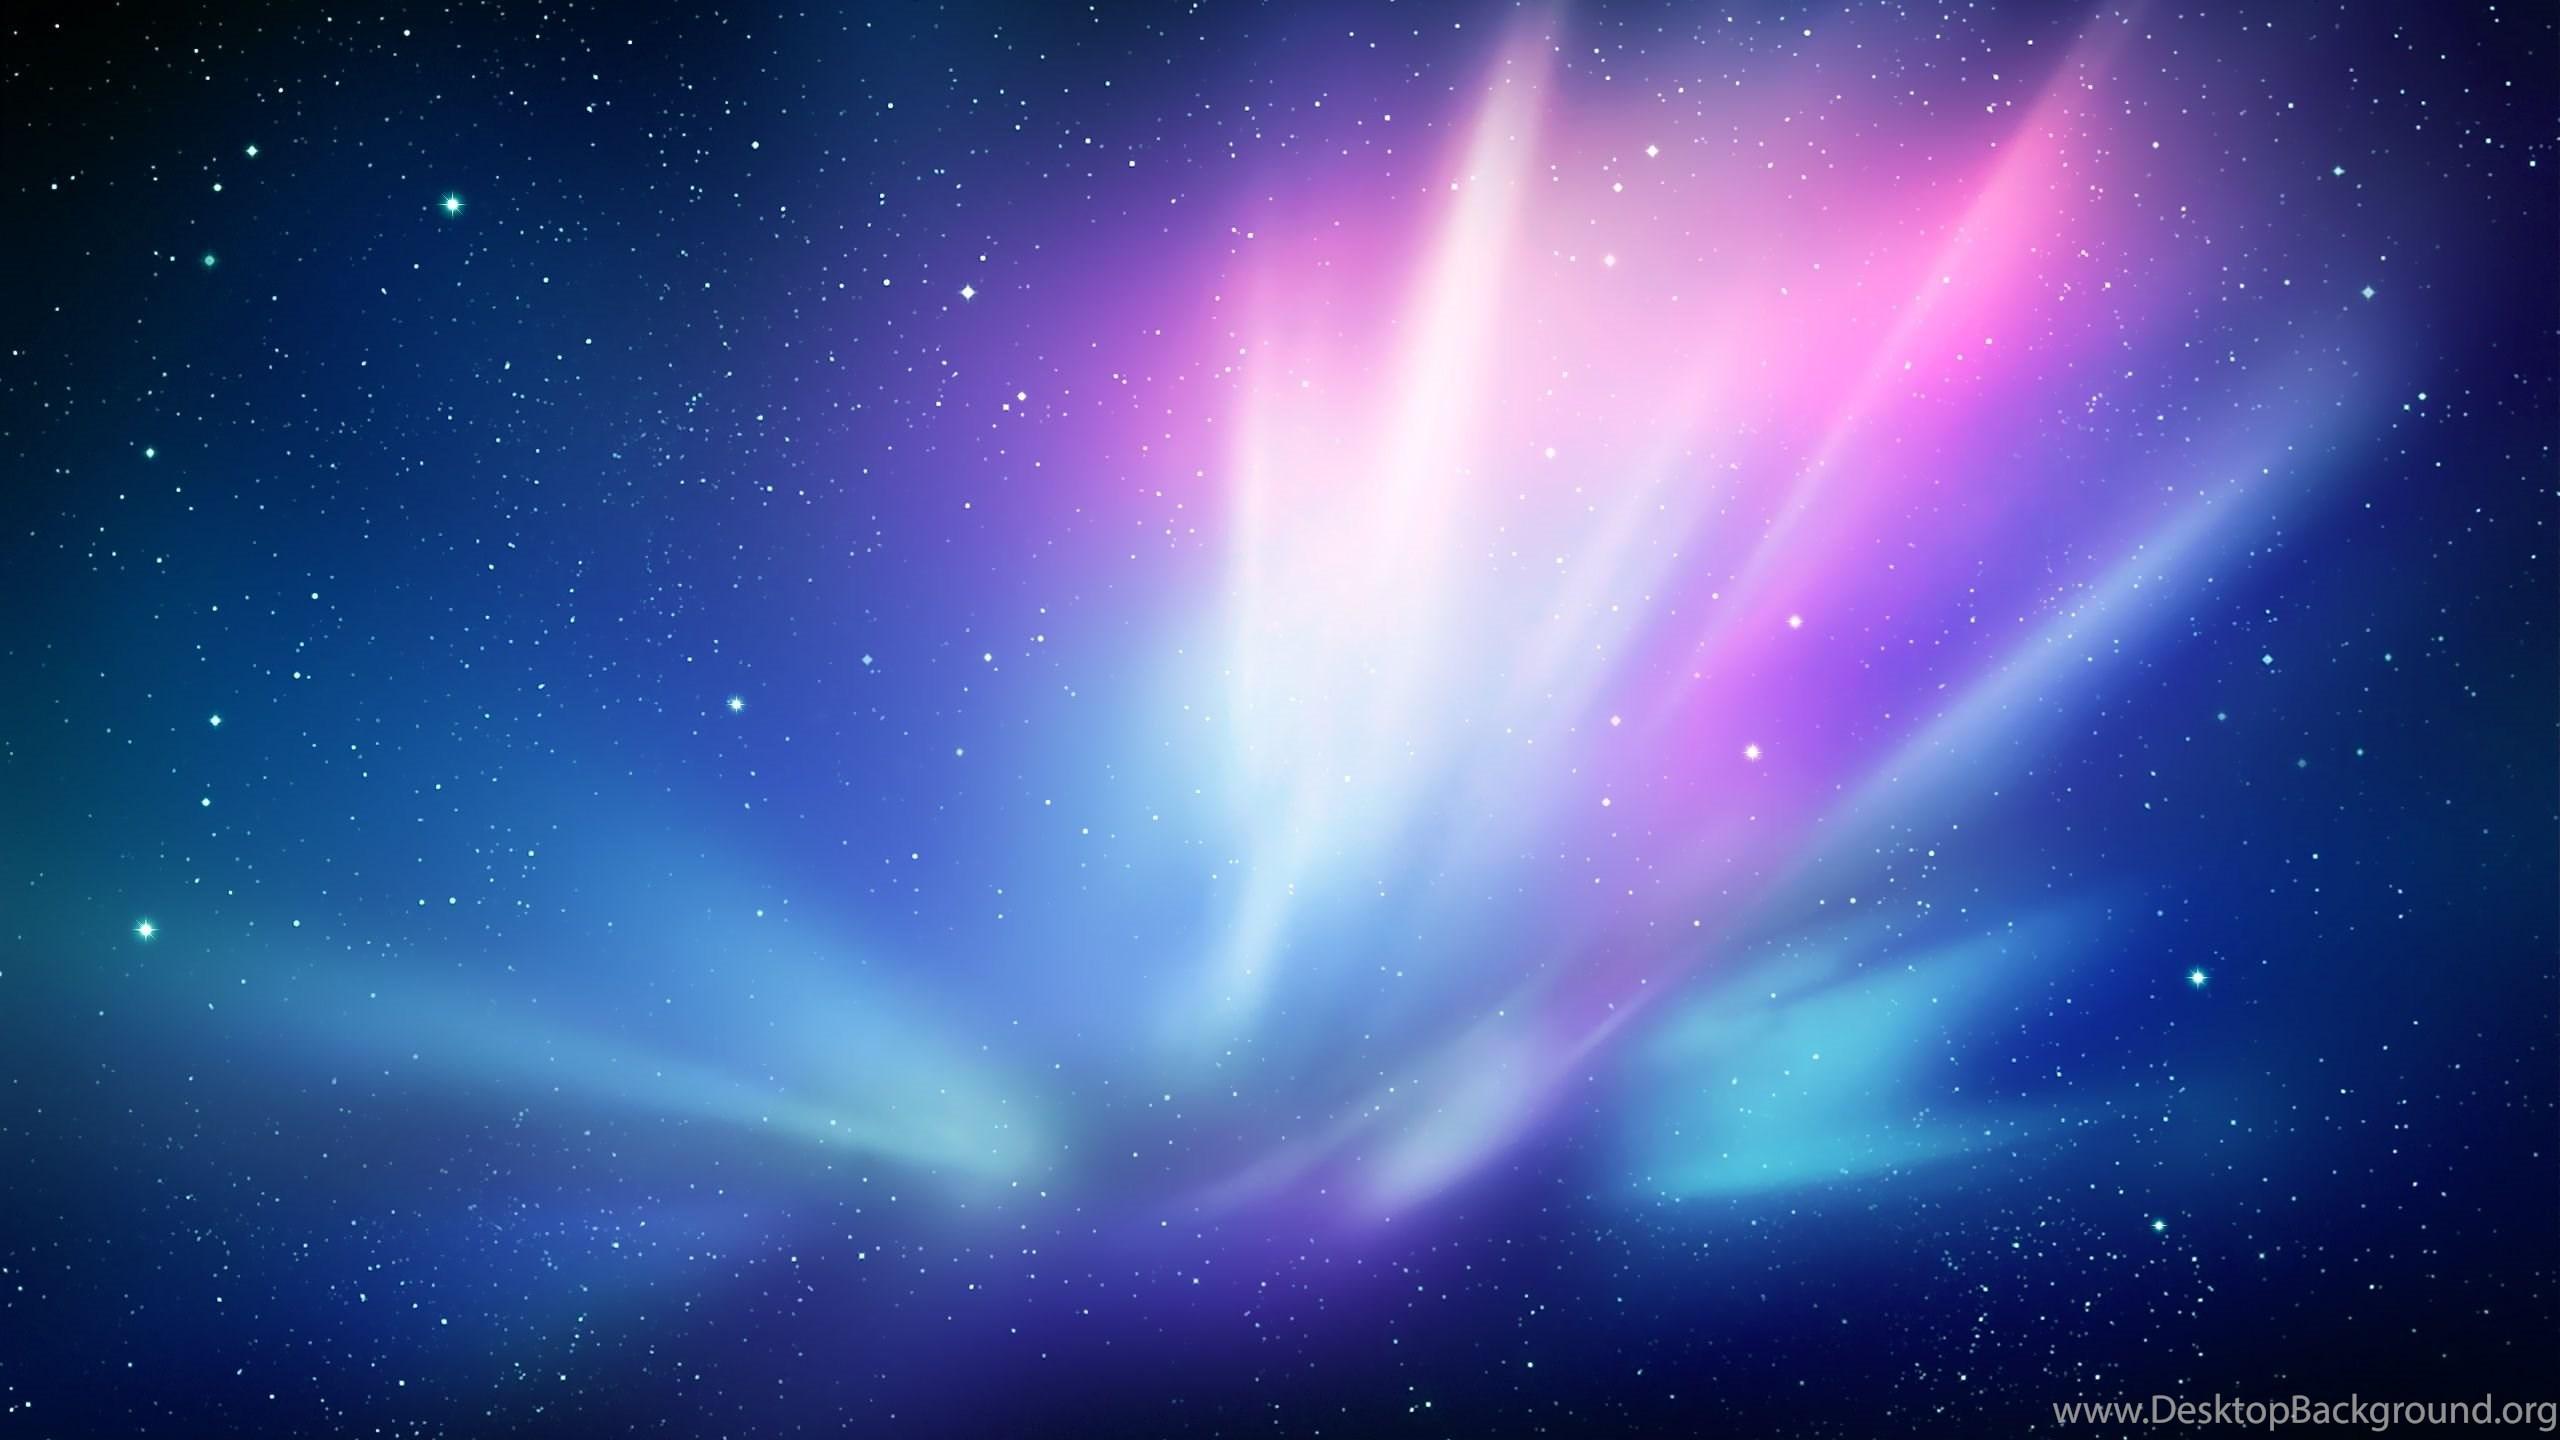 Mac Galaxy Hd Wallpapers Desktop Background